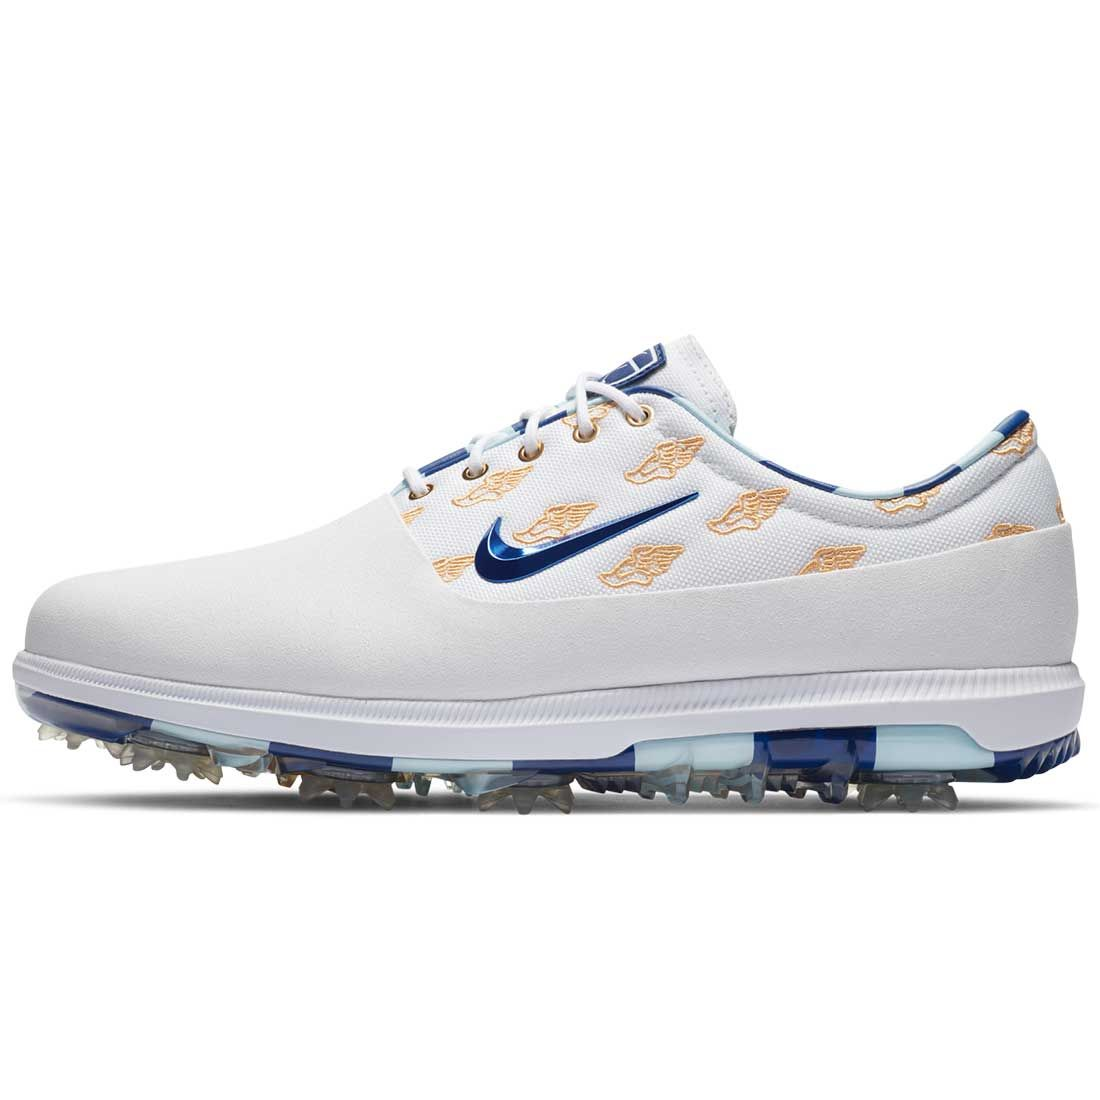 novedad techo molécula  Buy Nike Air Zoom Victory Tour U.S. Open LTD Golf Shoes | Golf Discount